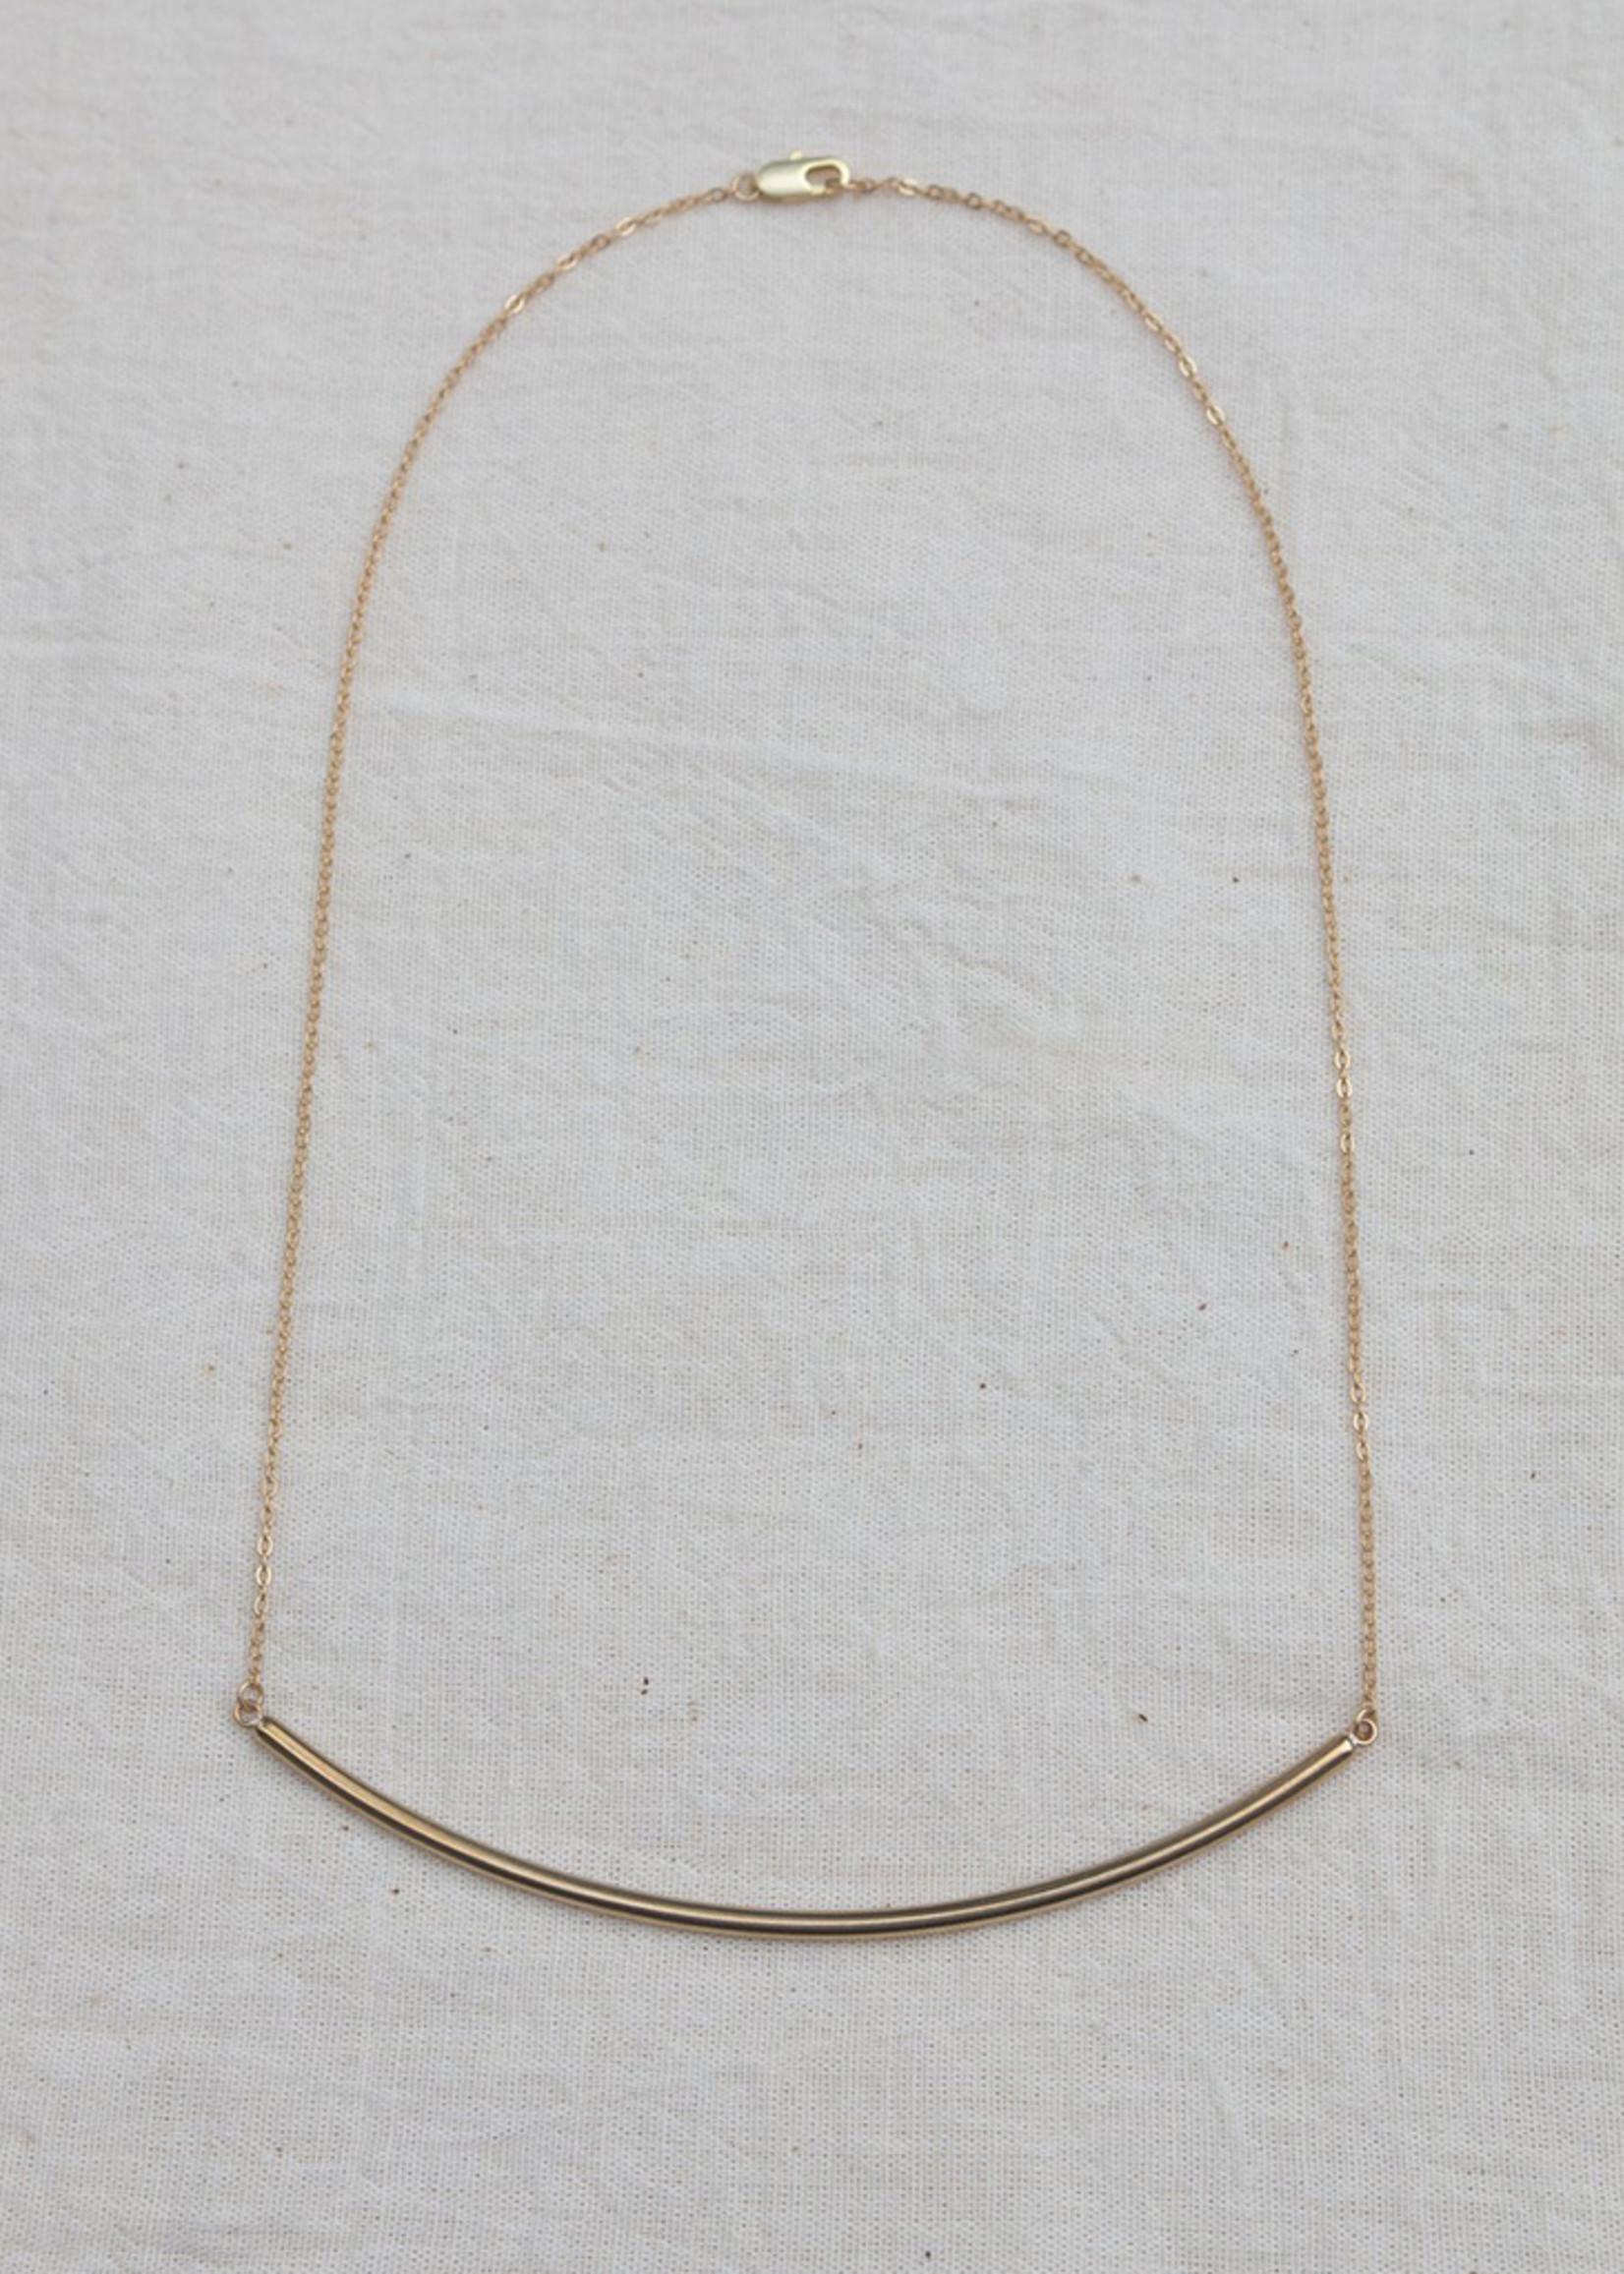 YEWO Sitima Necklace